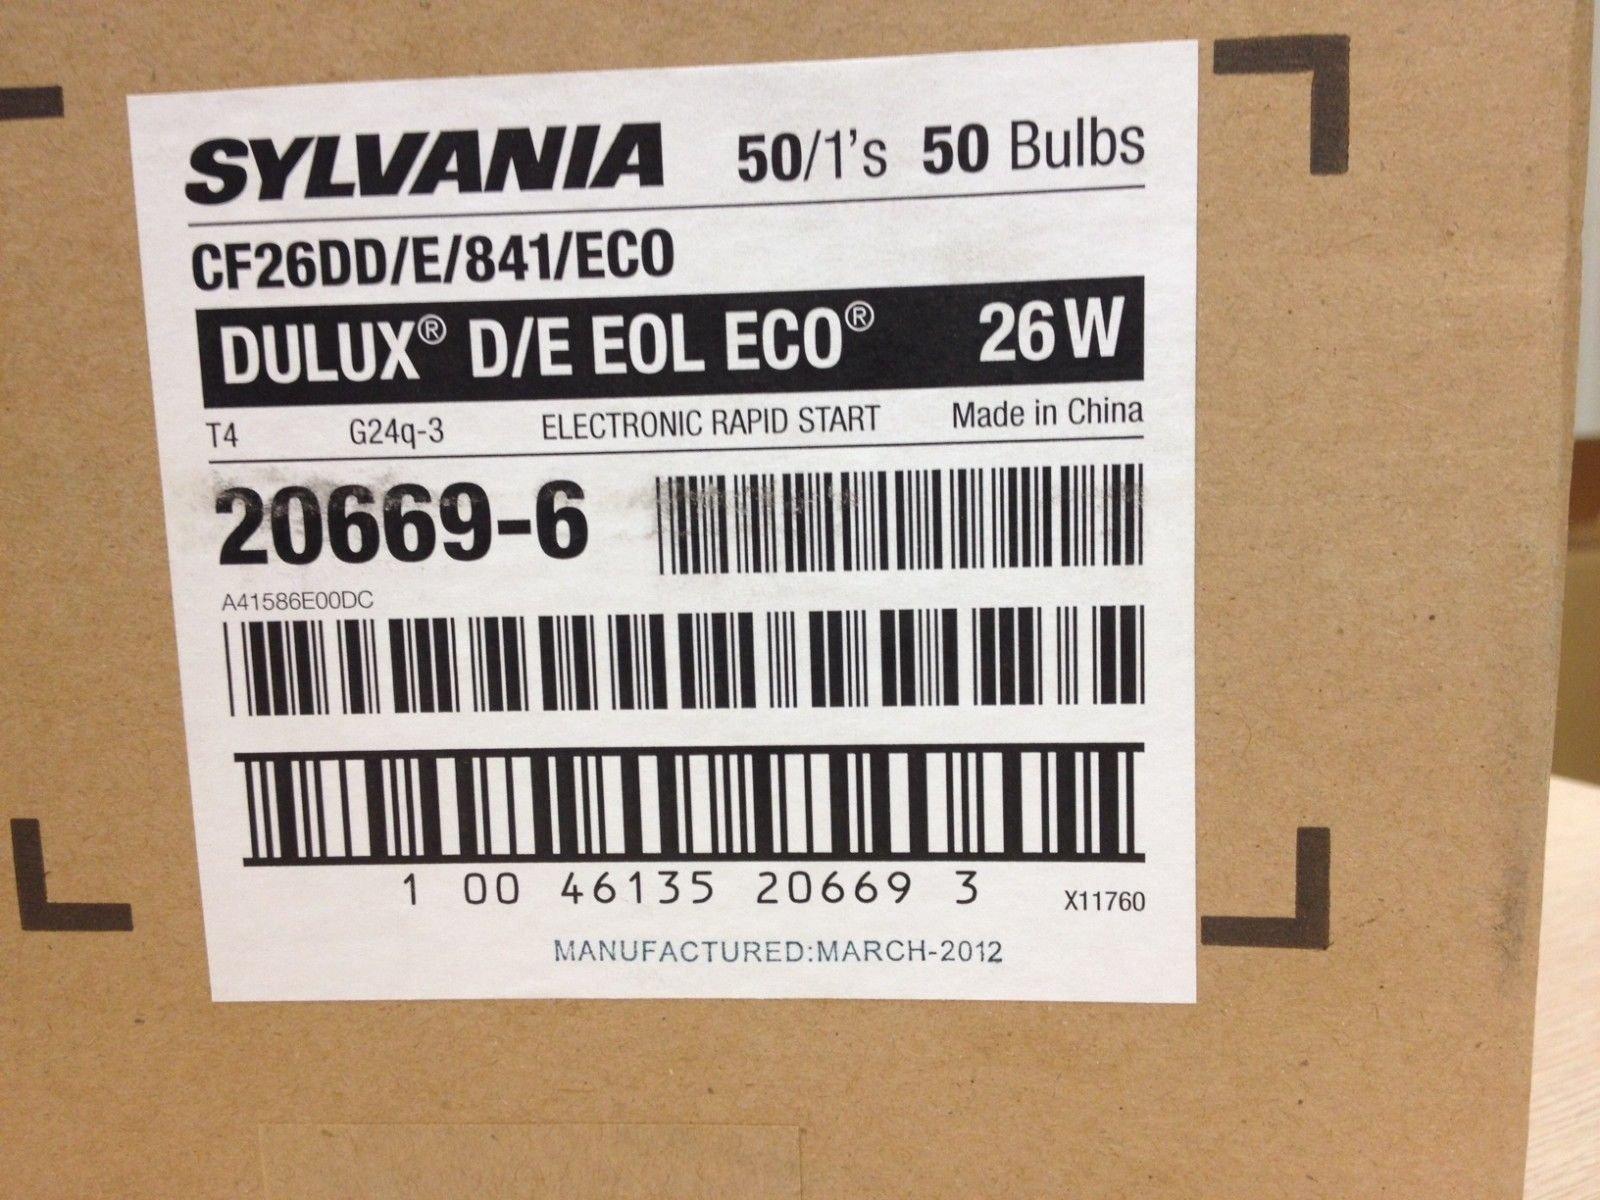 20 Sylvania 20669 Cf26DD/E/841/Eco Dulux D/E 26w 4-Pin G24Q-3 Cf Bulb